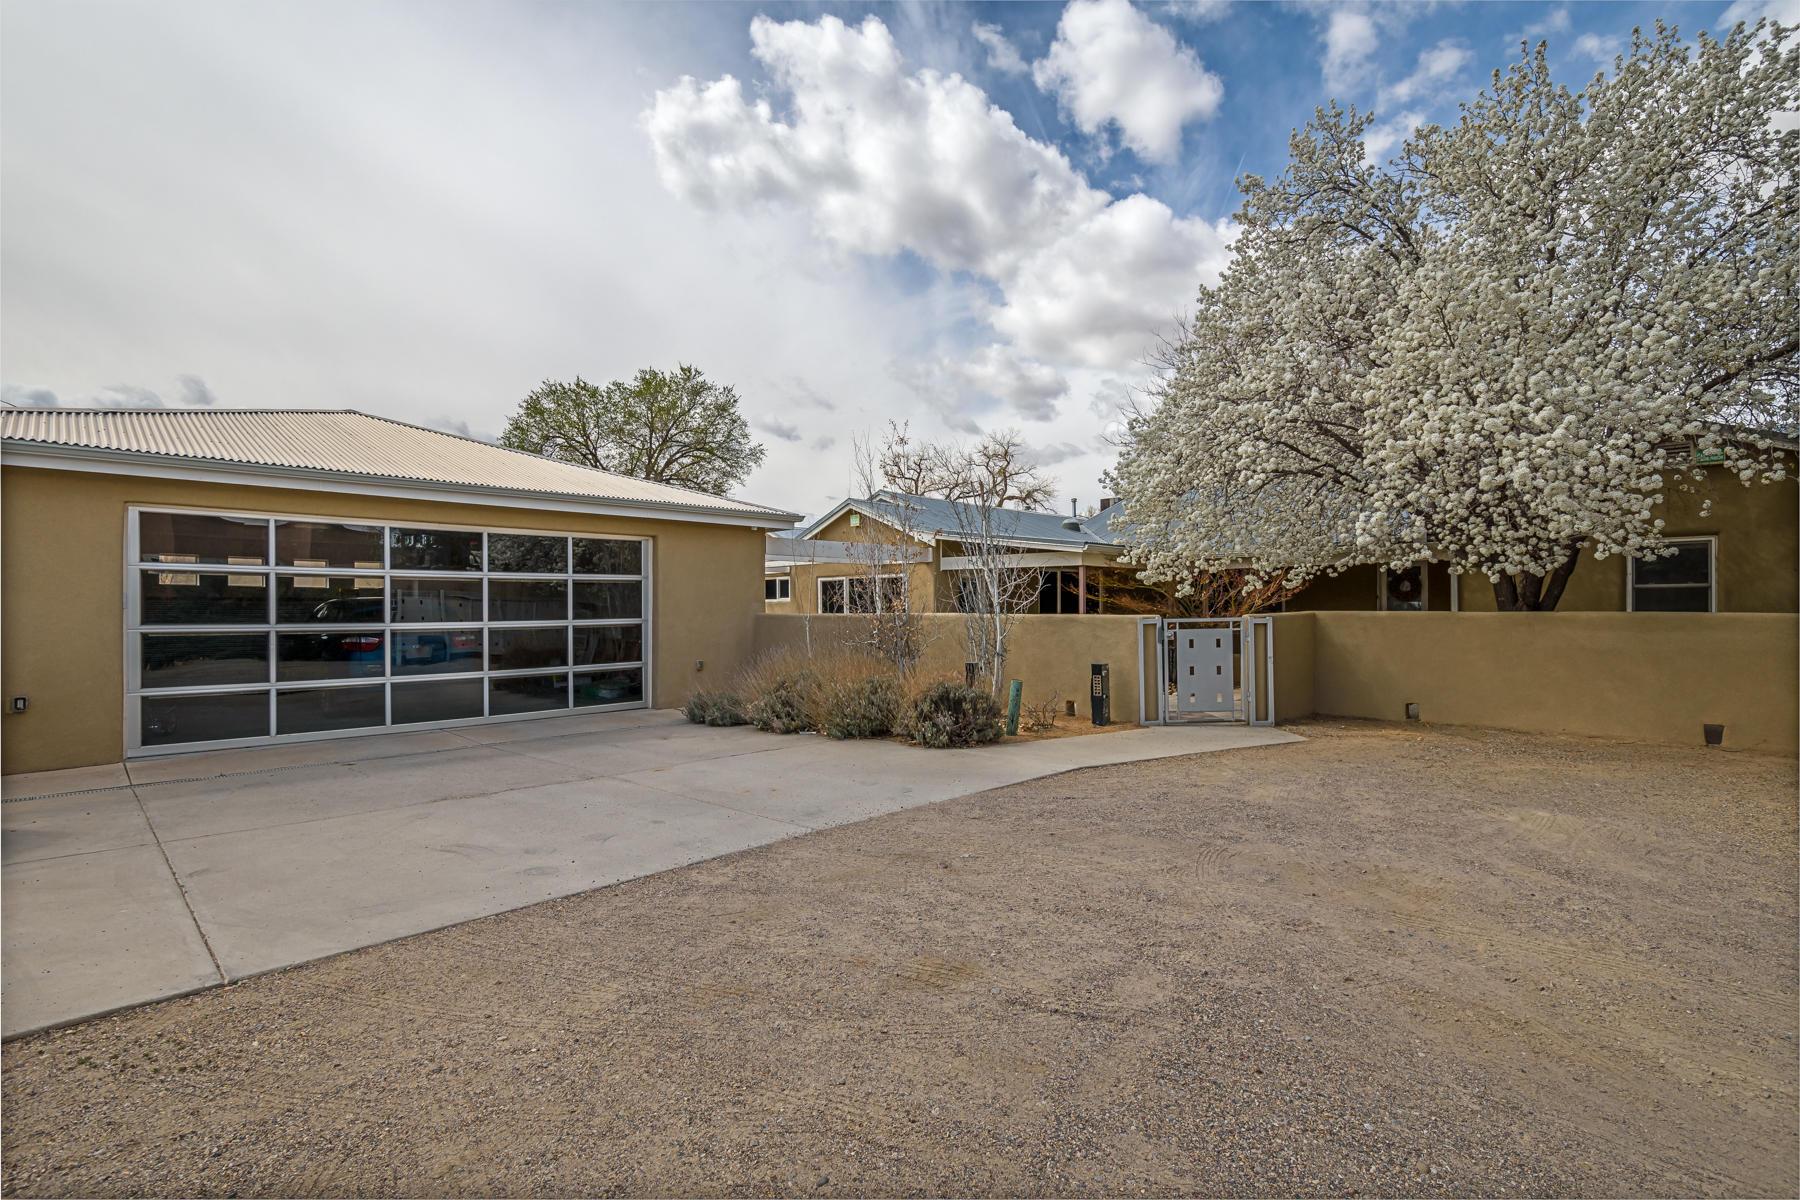 3025 RIO GRANDE Boulevard NW, Albuquerque, NM 87107 - Albuquerque, NM real estate listing